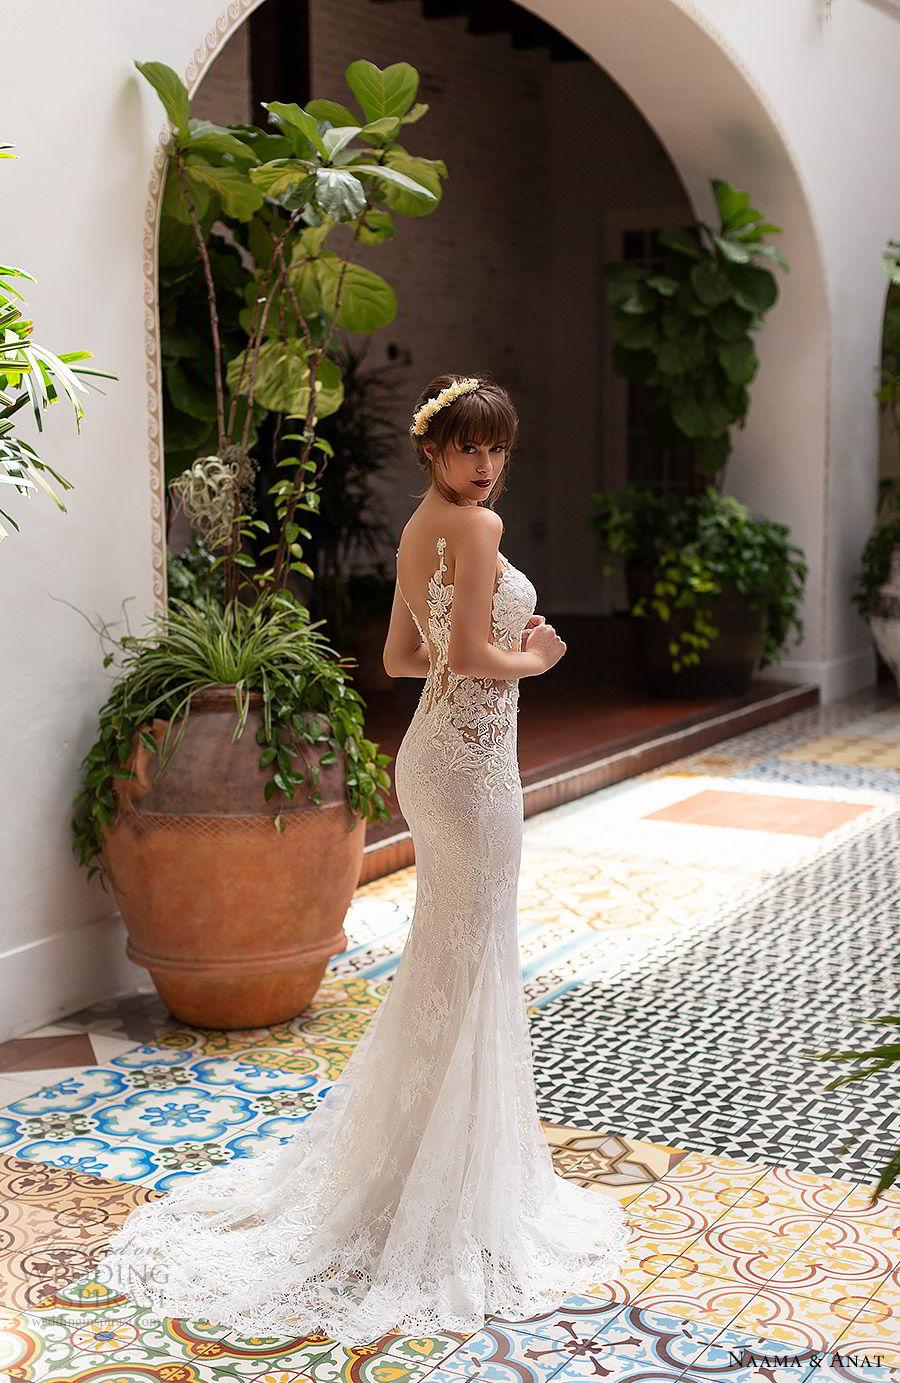 naama anat 2019 bridal sleeveless deep plunging sweetheart neckline sheath fit flare lace wedding dress low back chapel train sexy elegant (3) bv